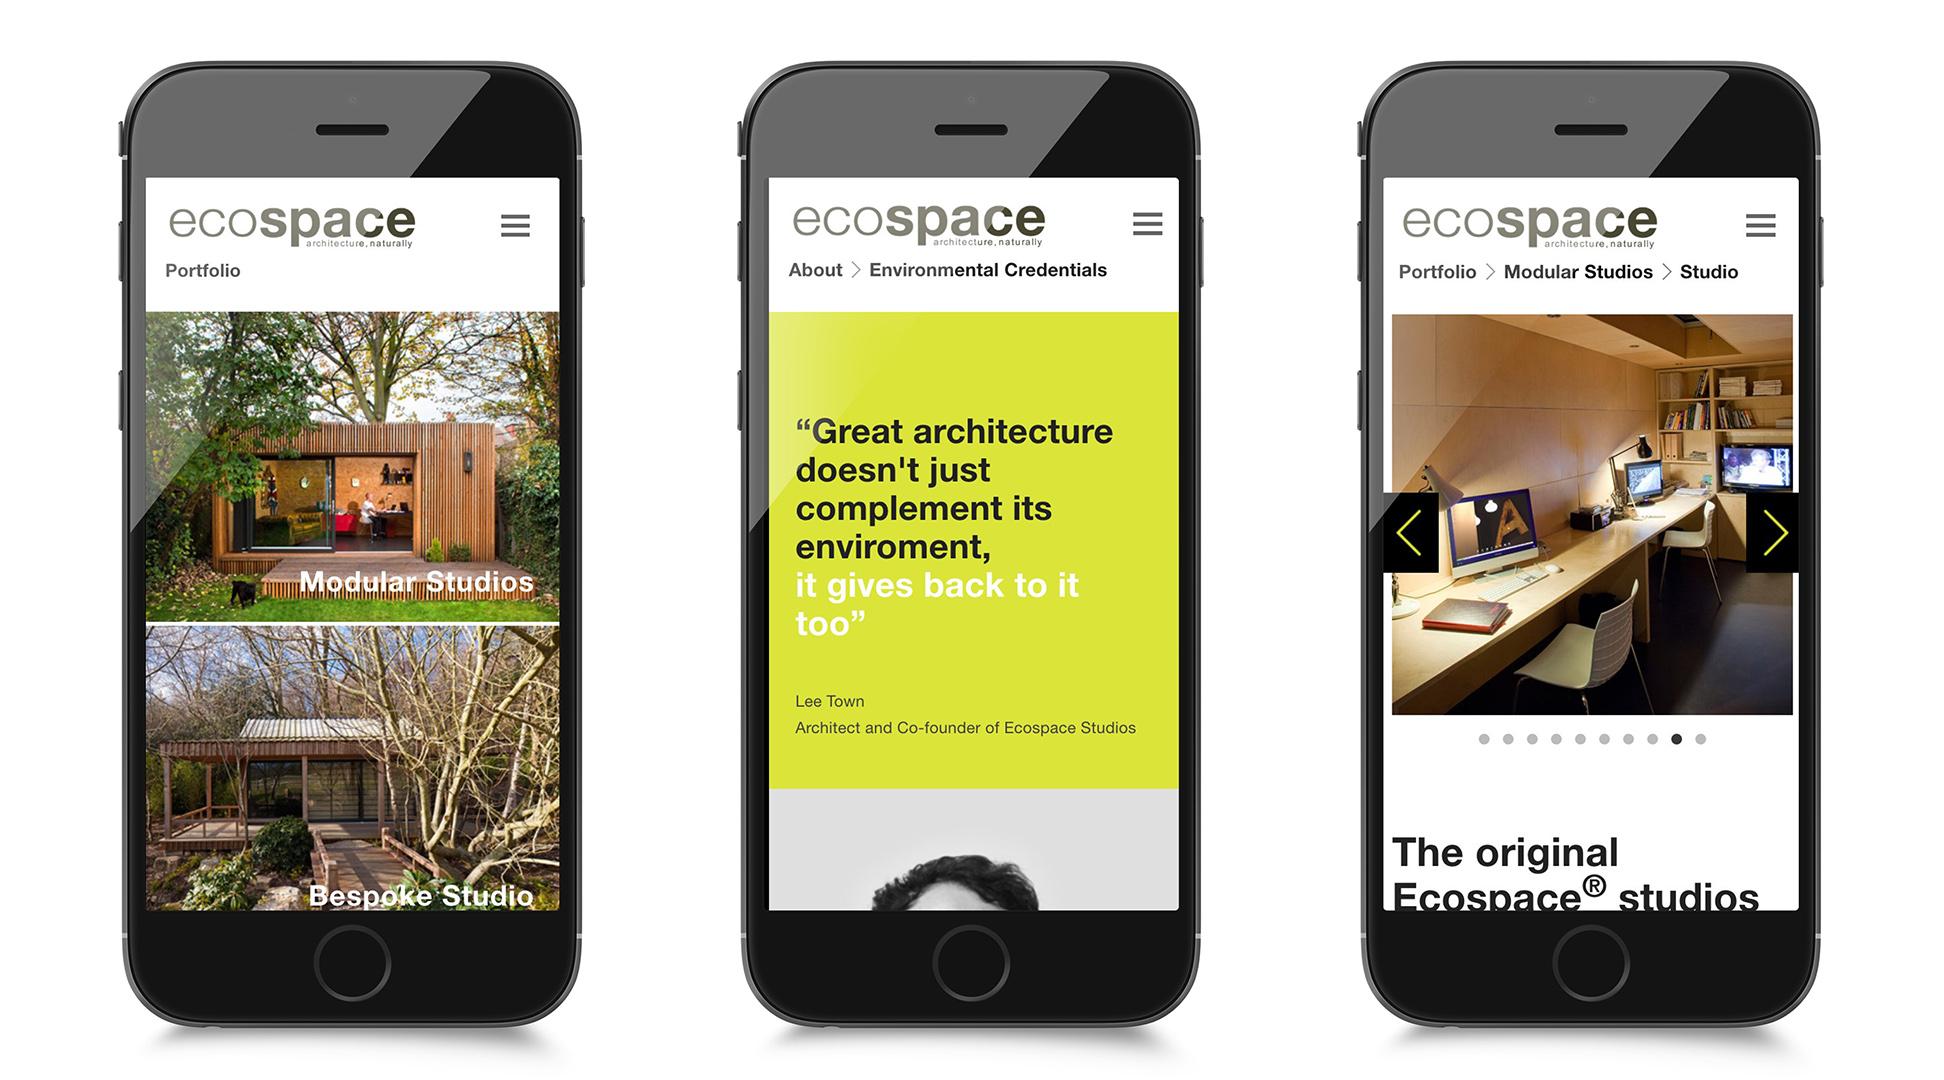 Ecospace-Tamassy-iPhone6